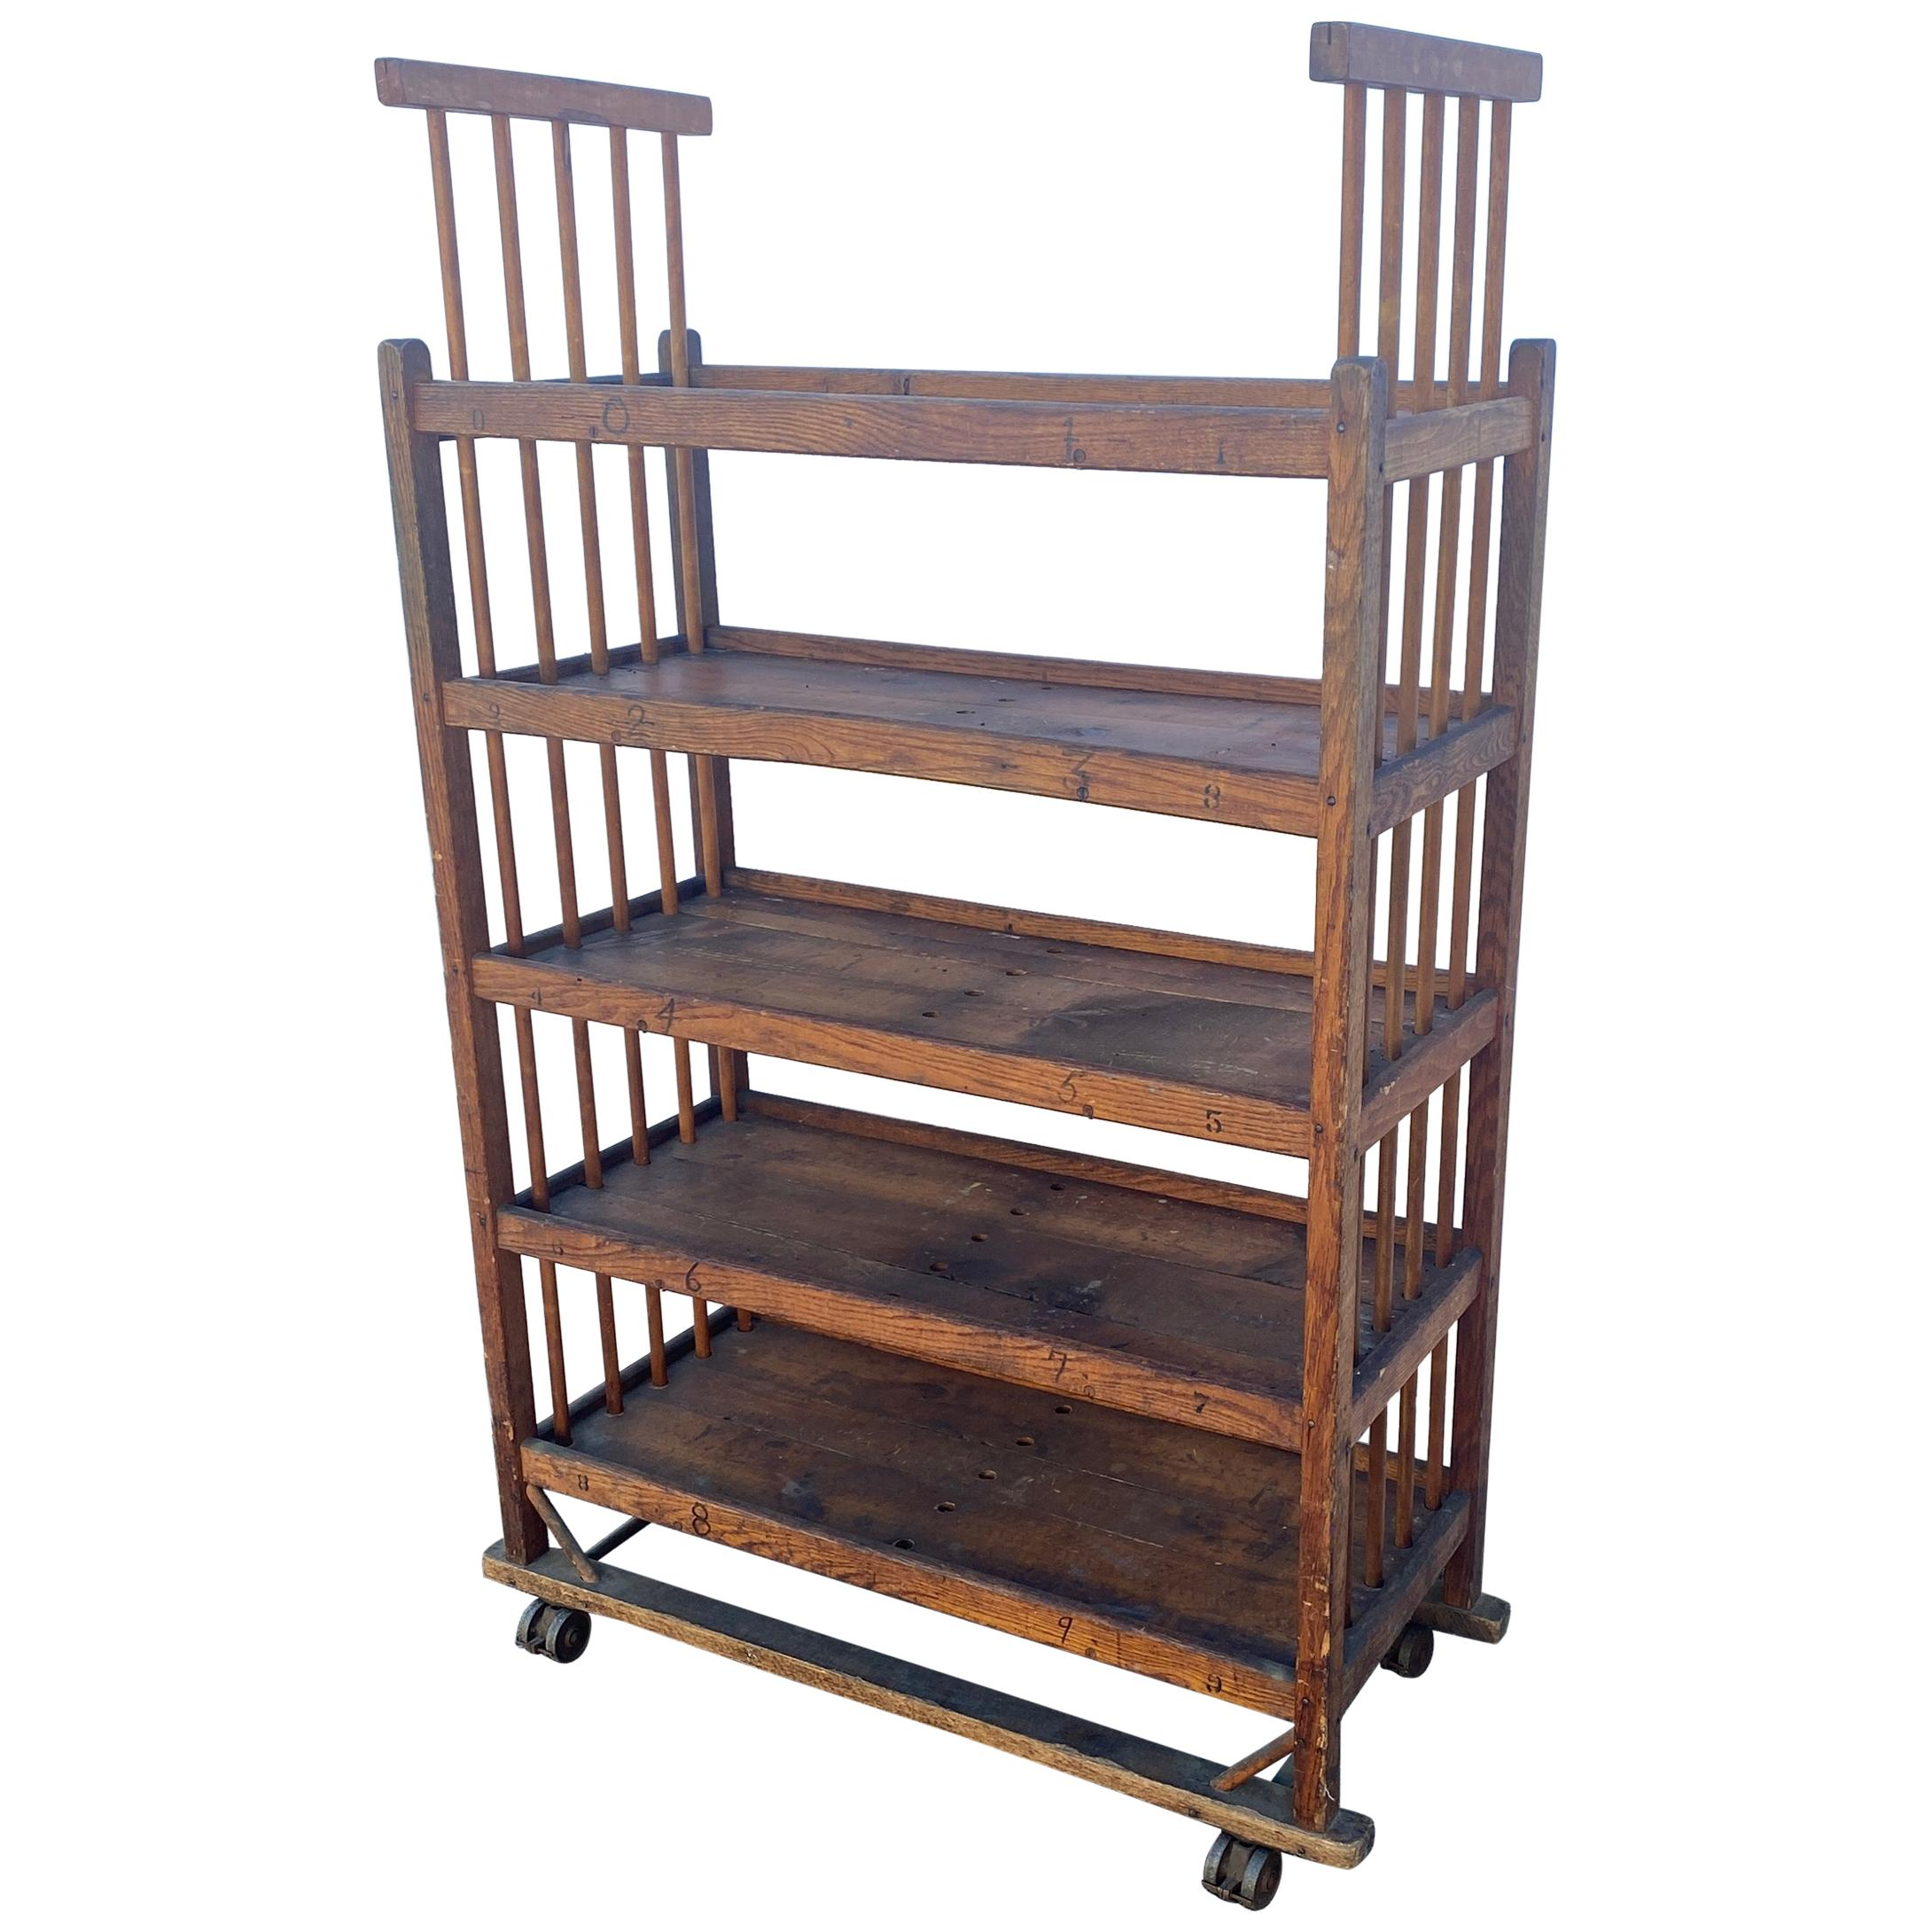 American 1930s Wooden Bread Rack Or Cart